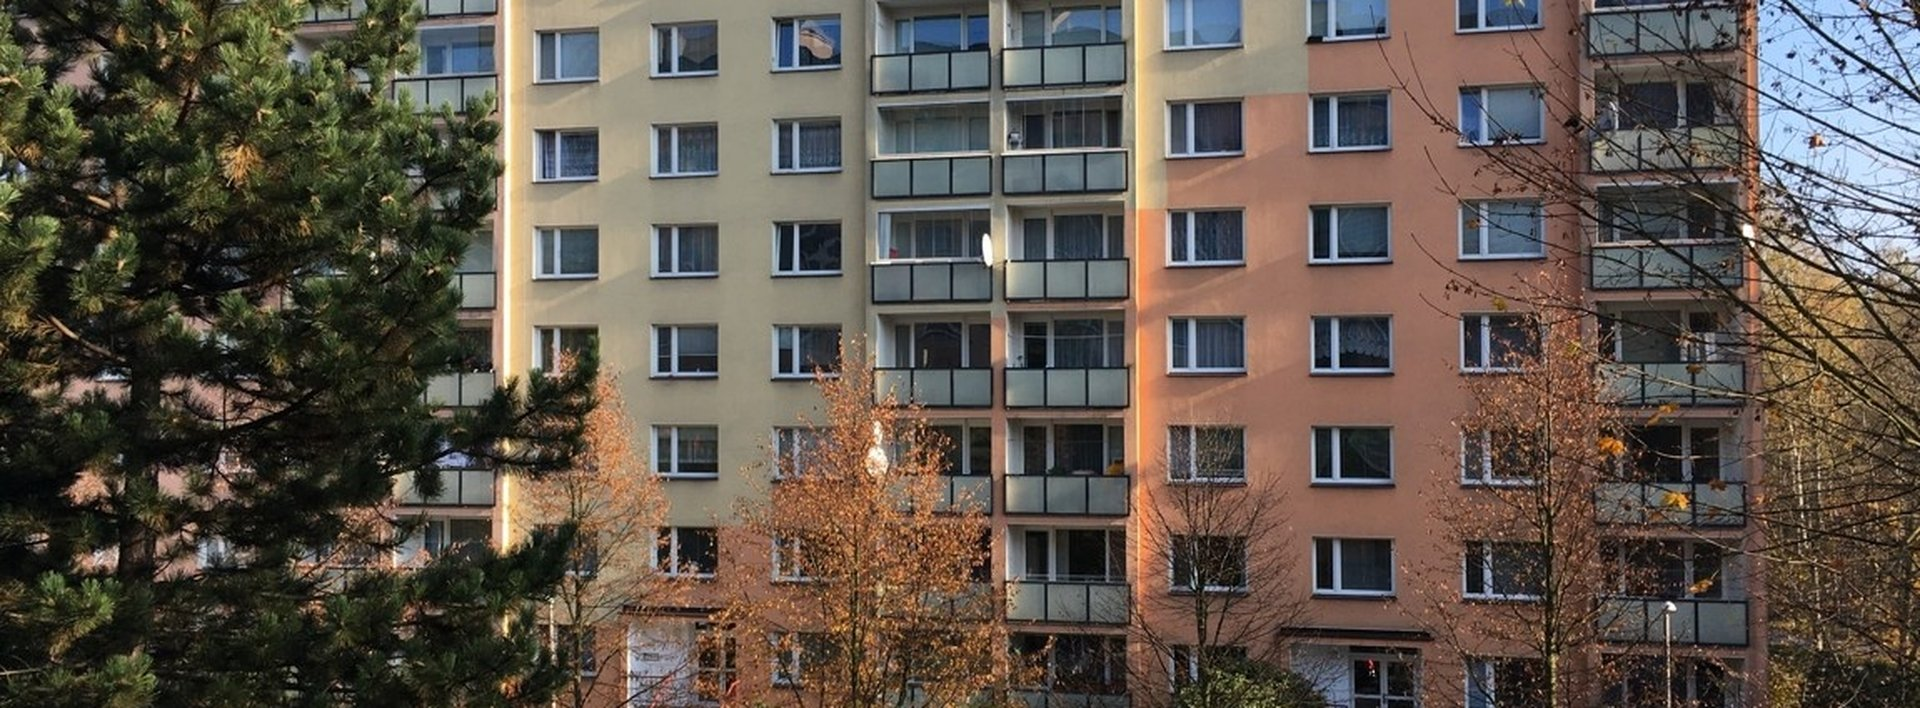 Pronájem bytu 1+1, 36 m² s lodžií, Ev.č.: N49221